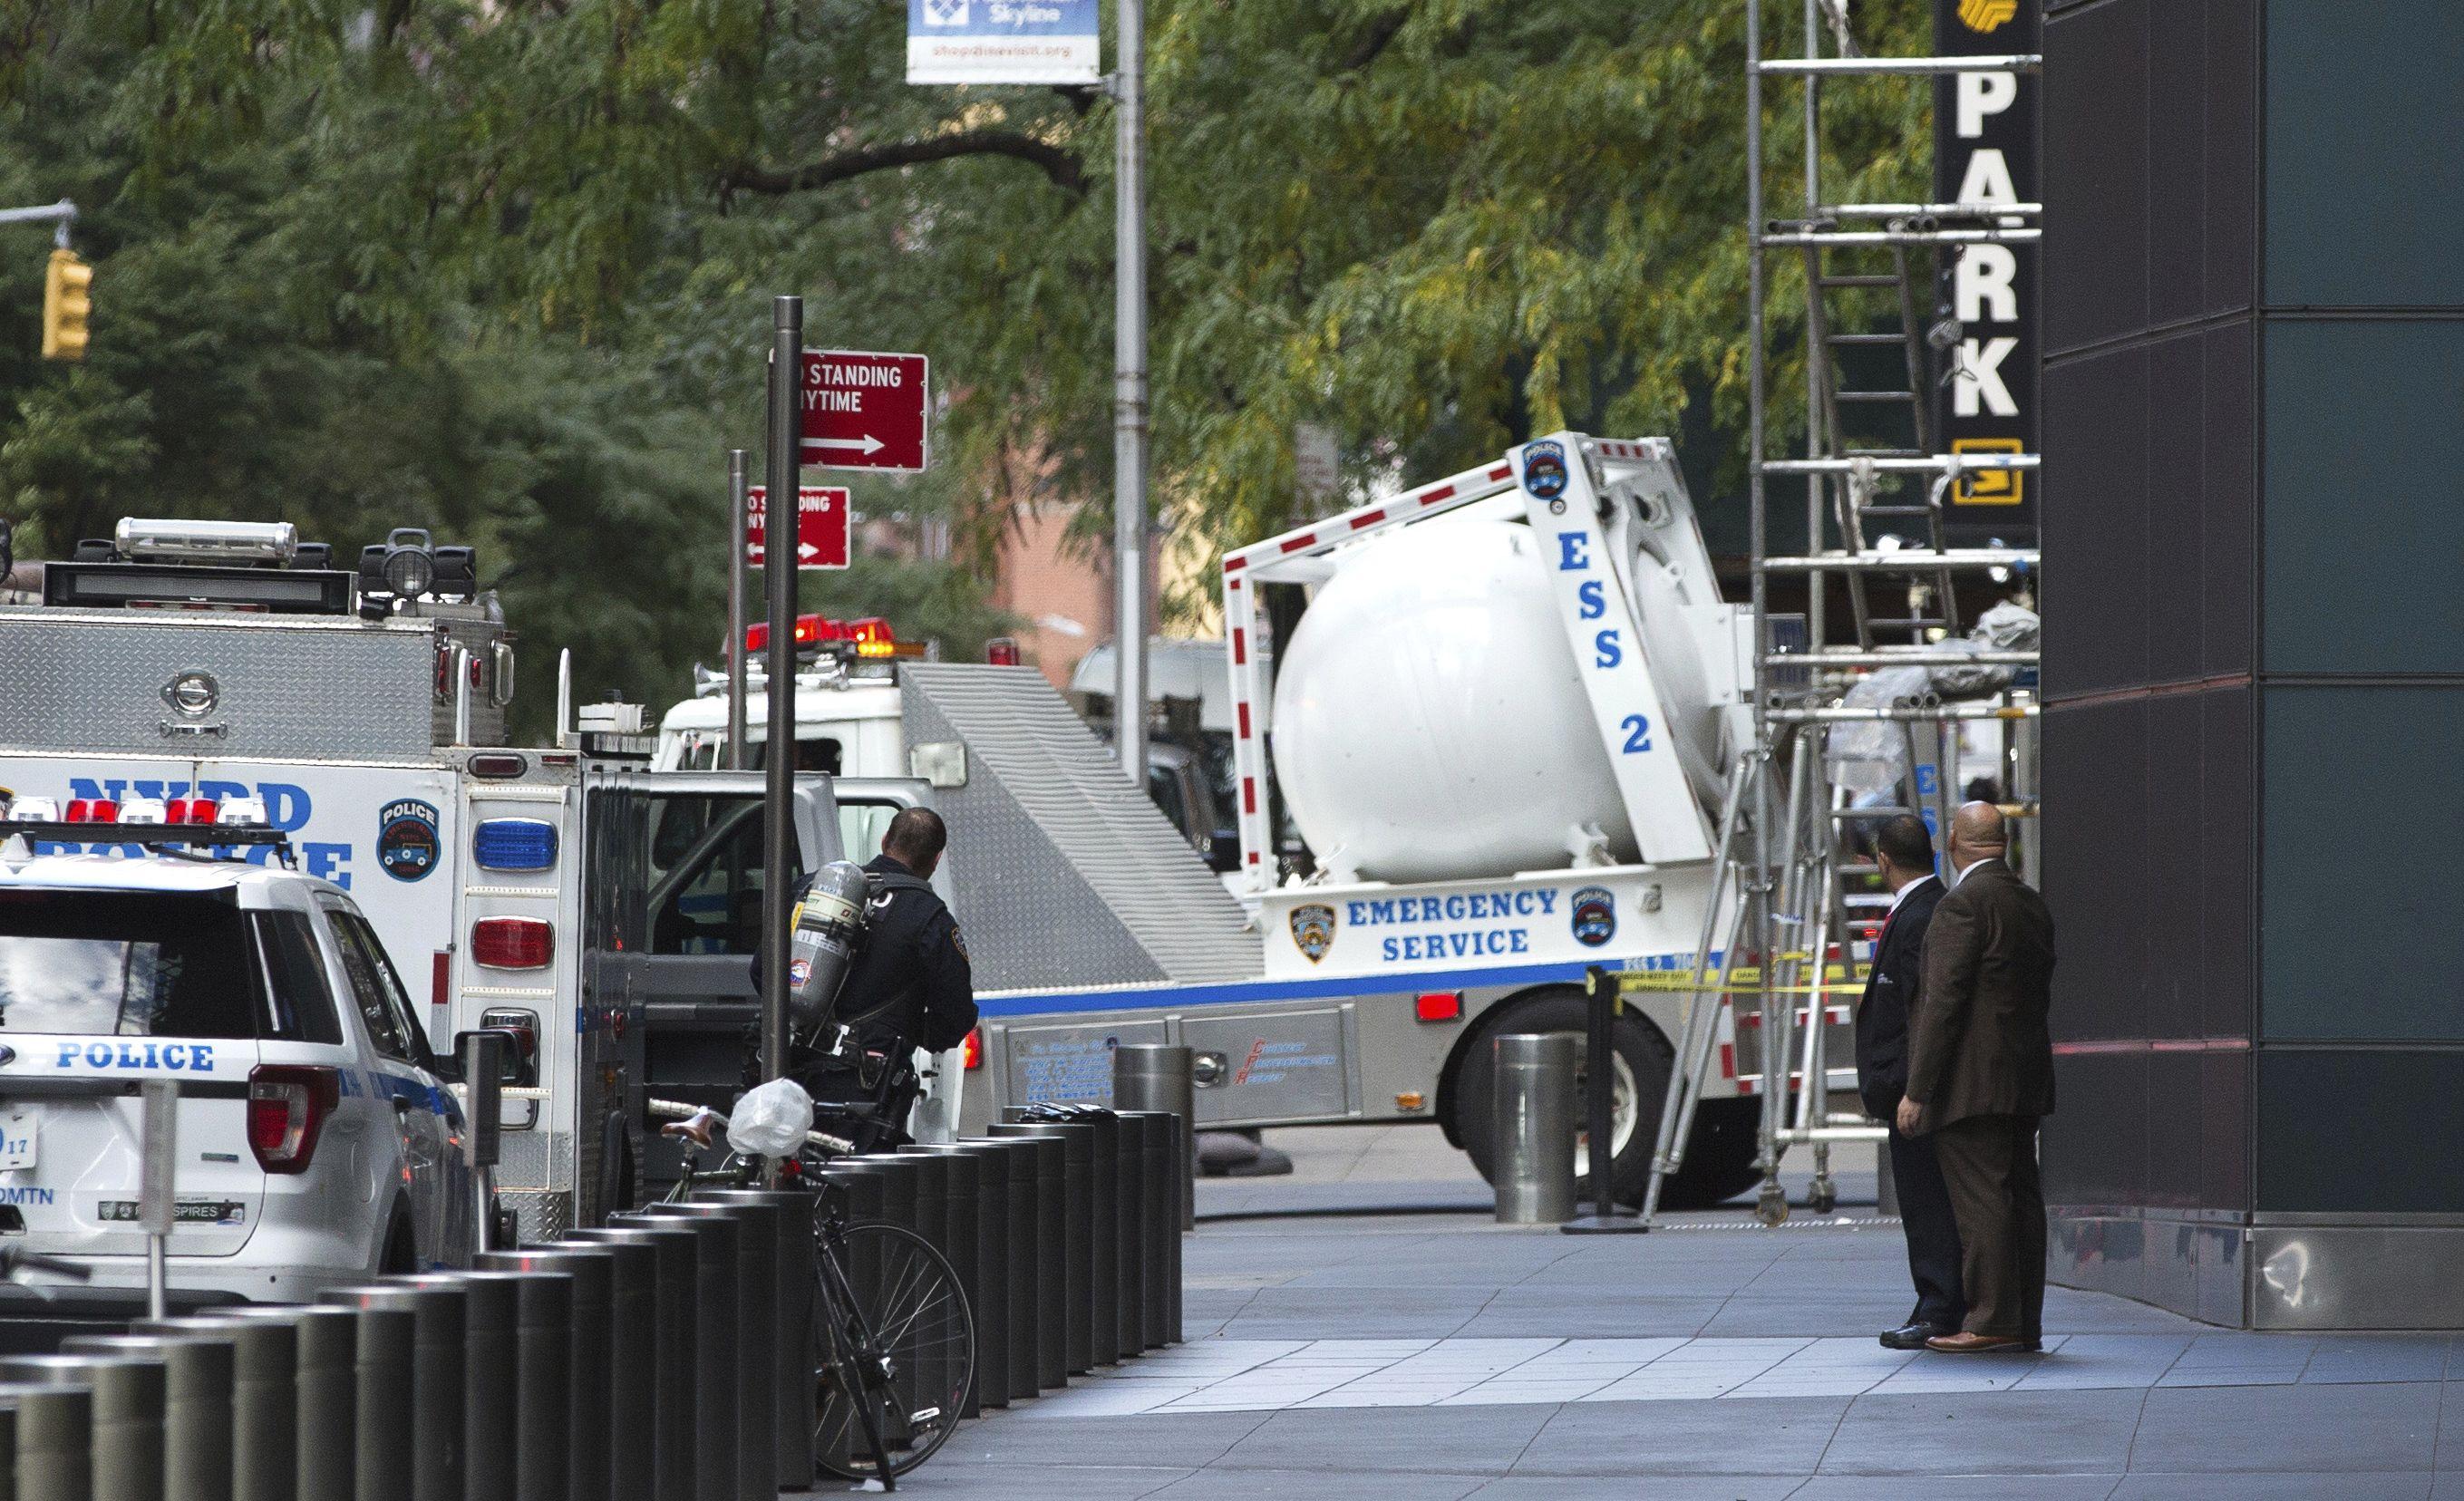 Envían bombas a demócratas mientras crece tensión política